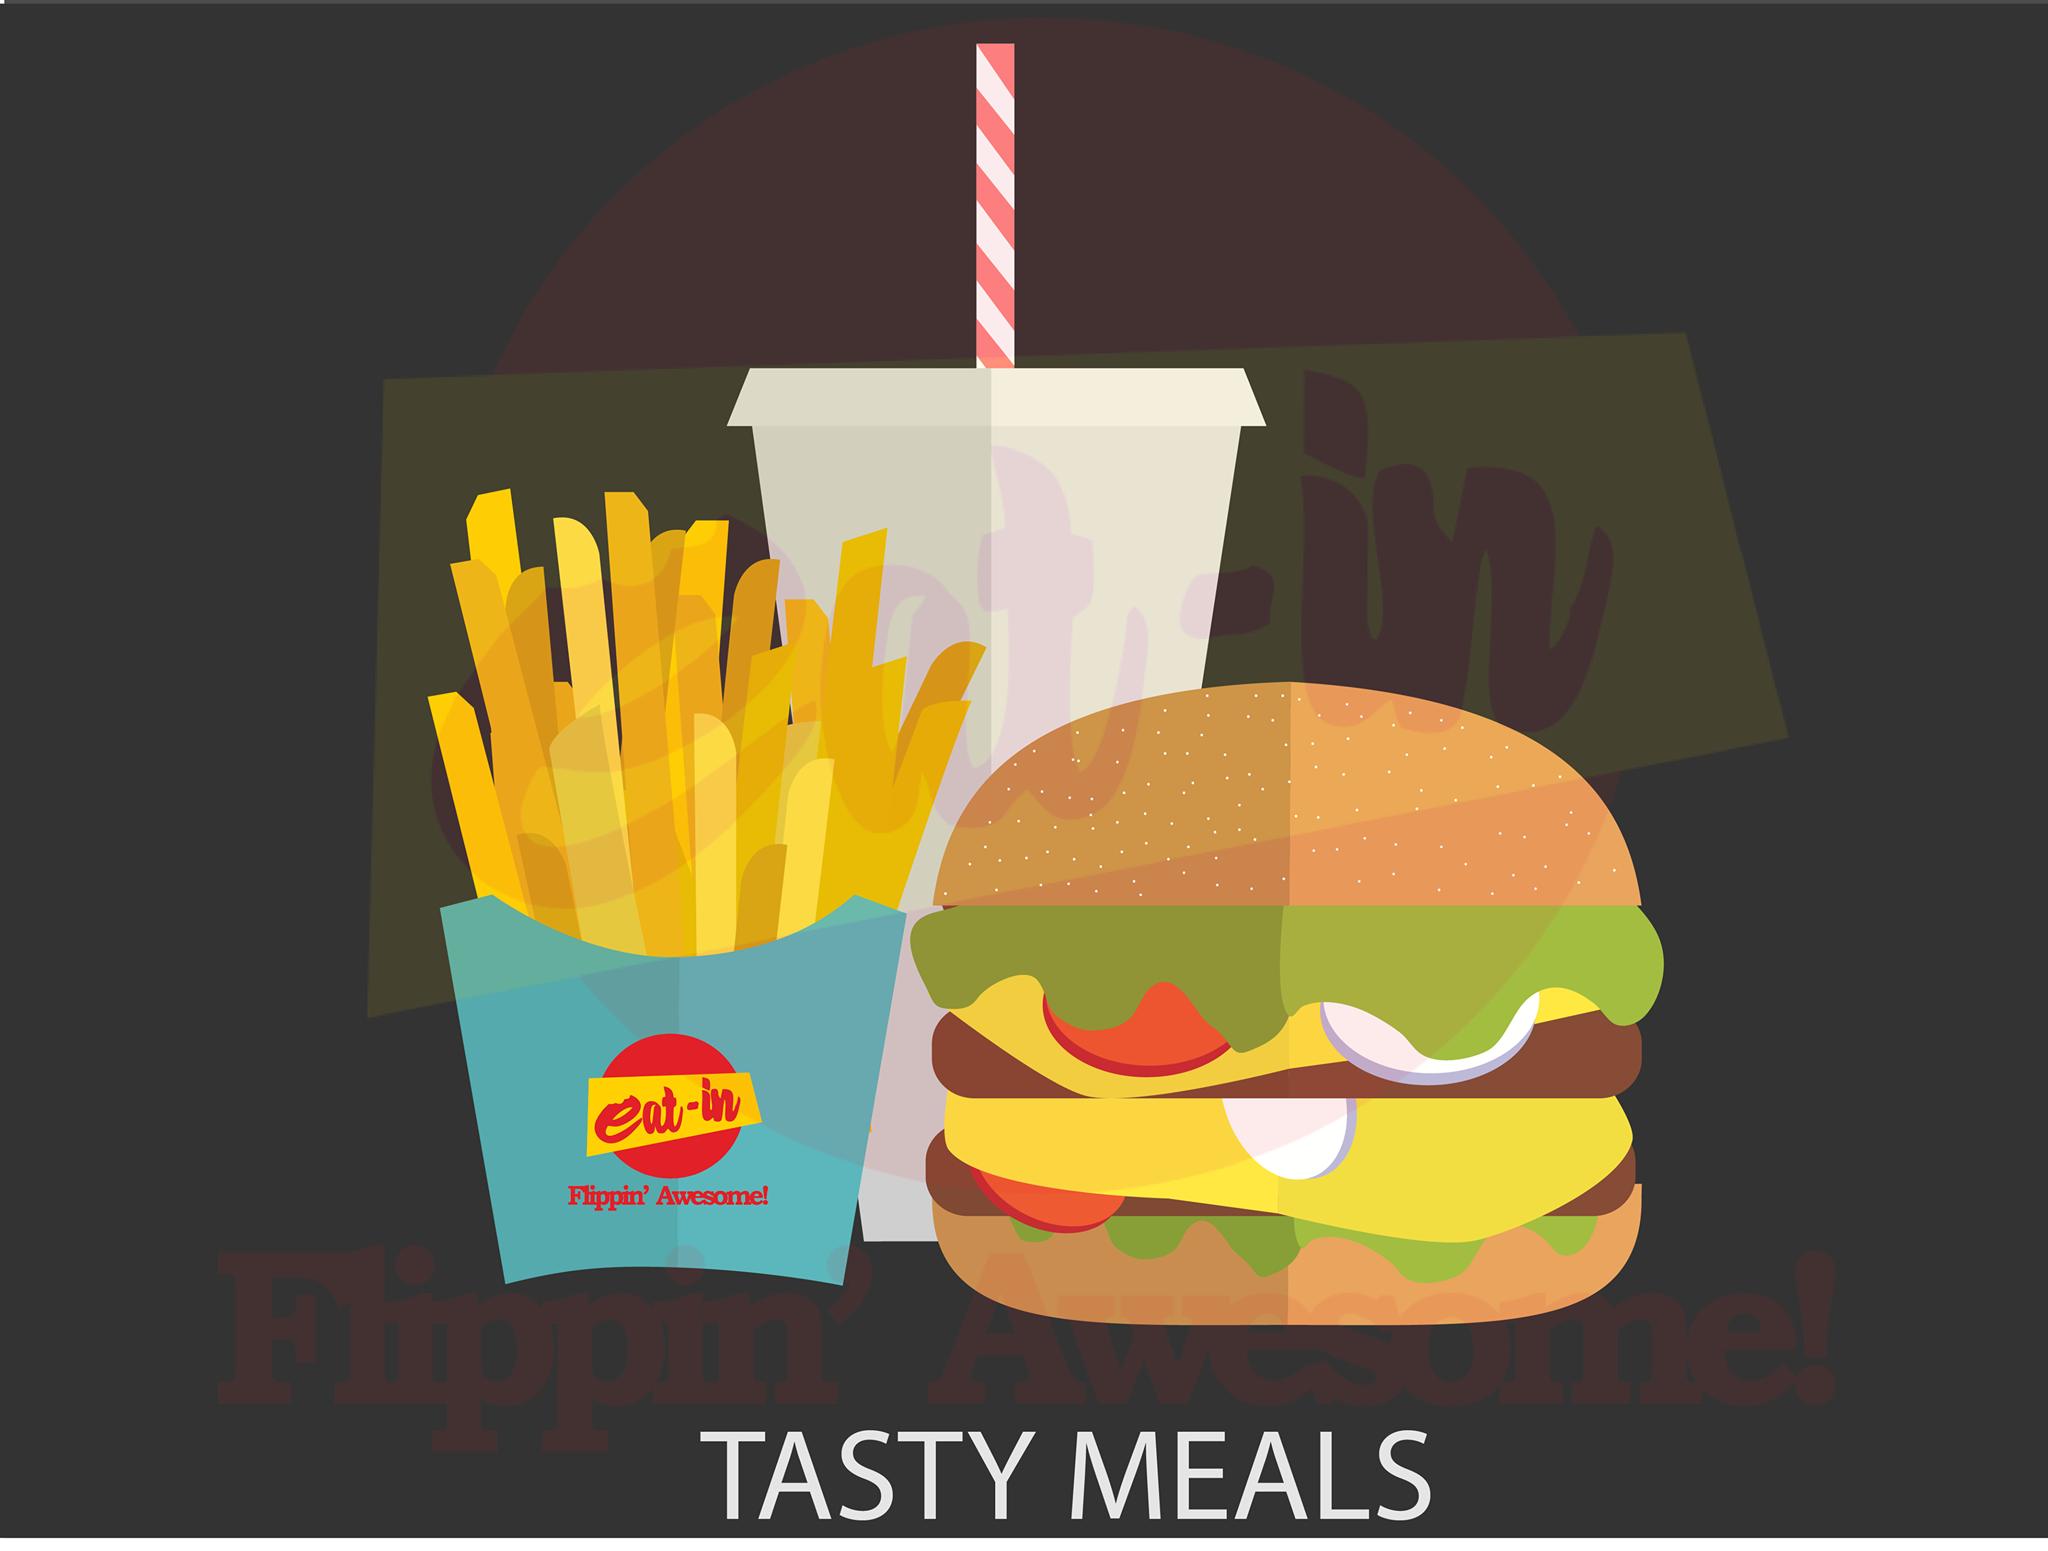 Pin by Eatin on Fast Food Fast food, Tasty, Yummy food